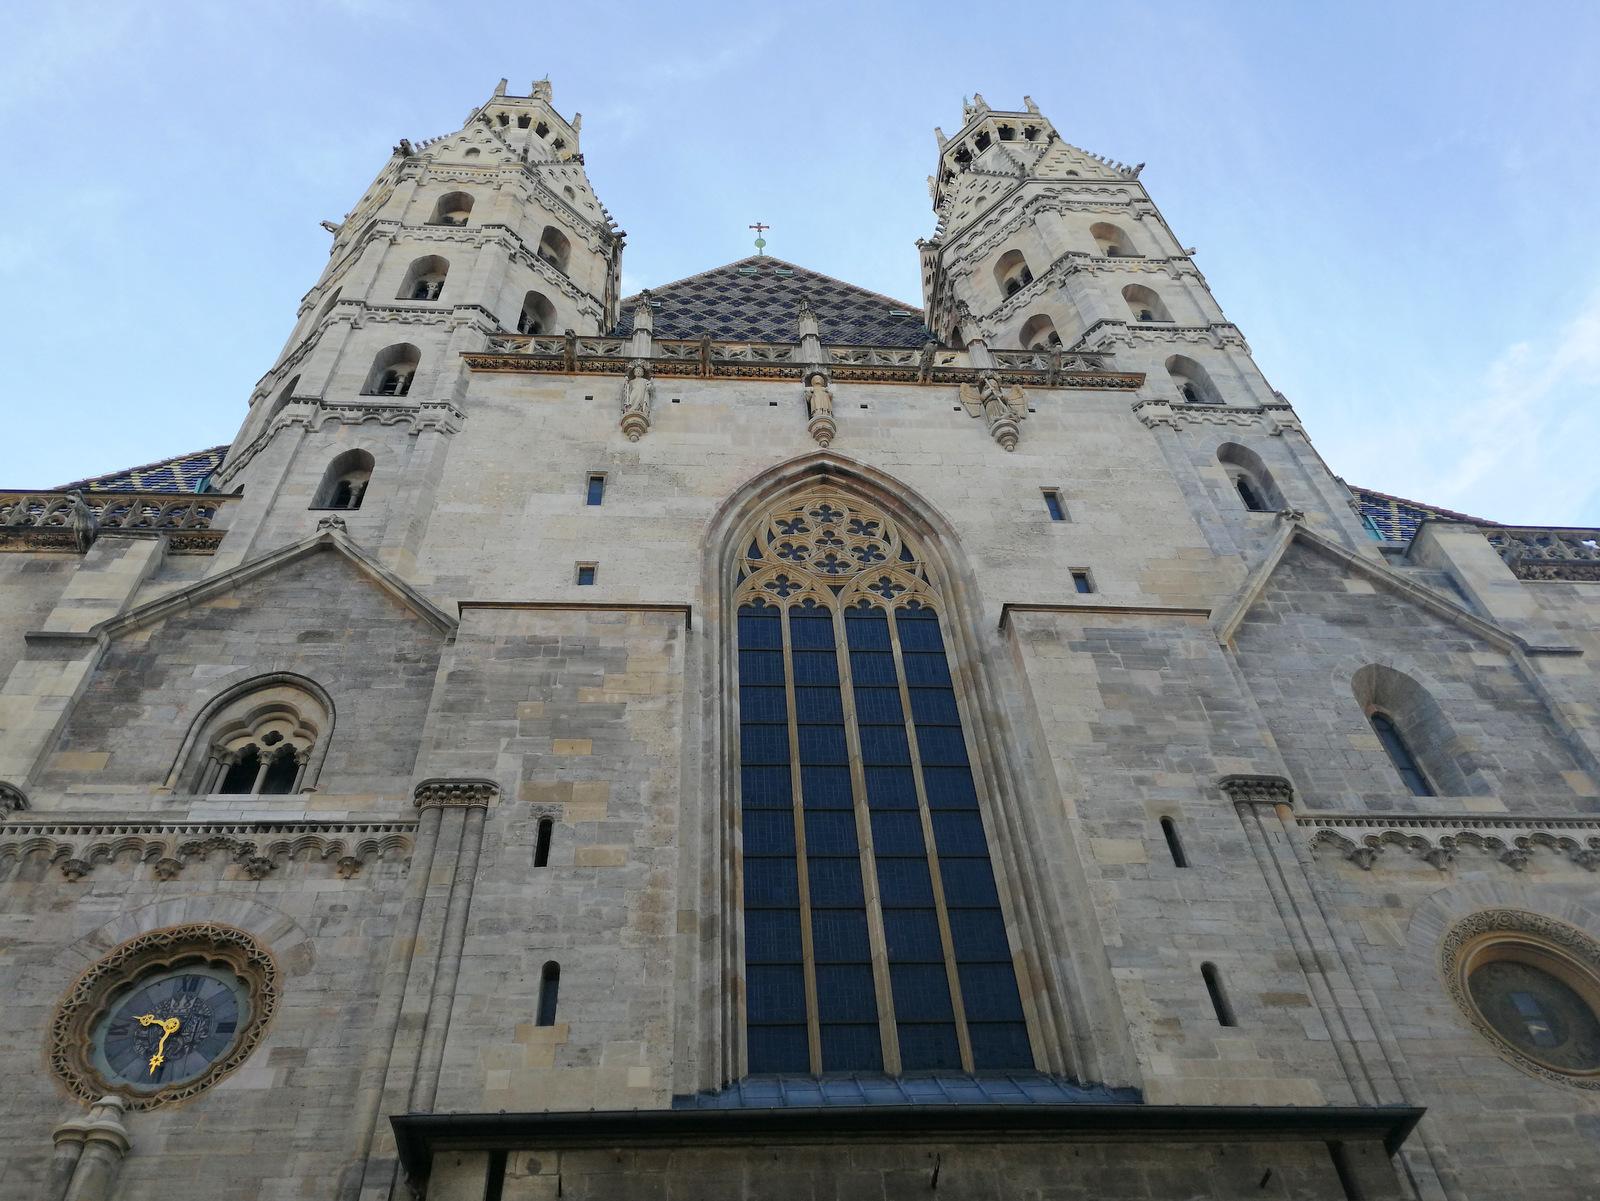 Katedrala sv. Štefana